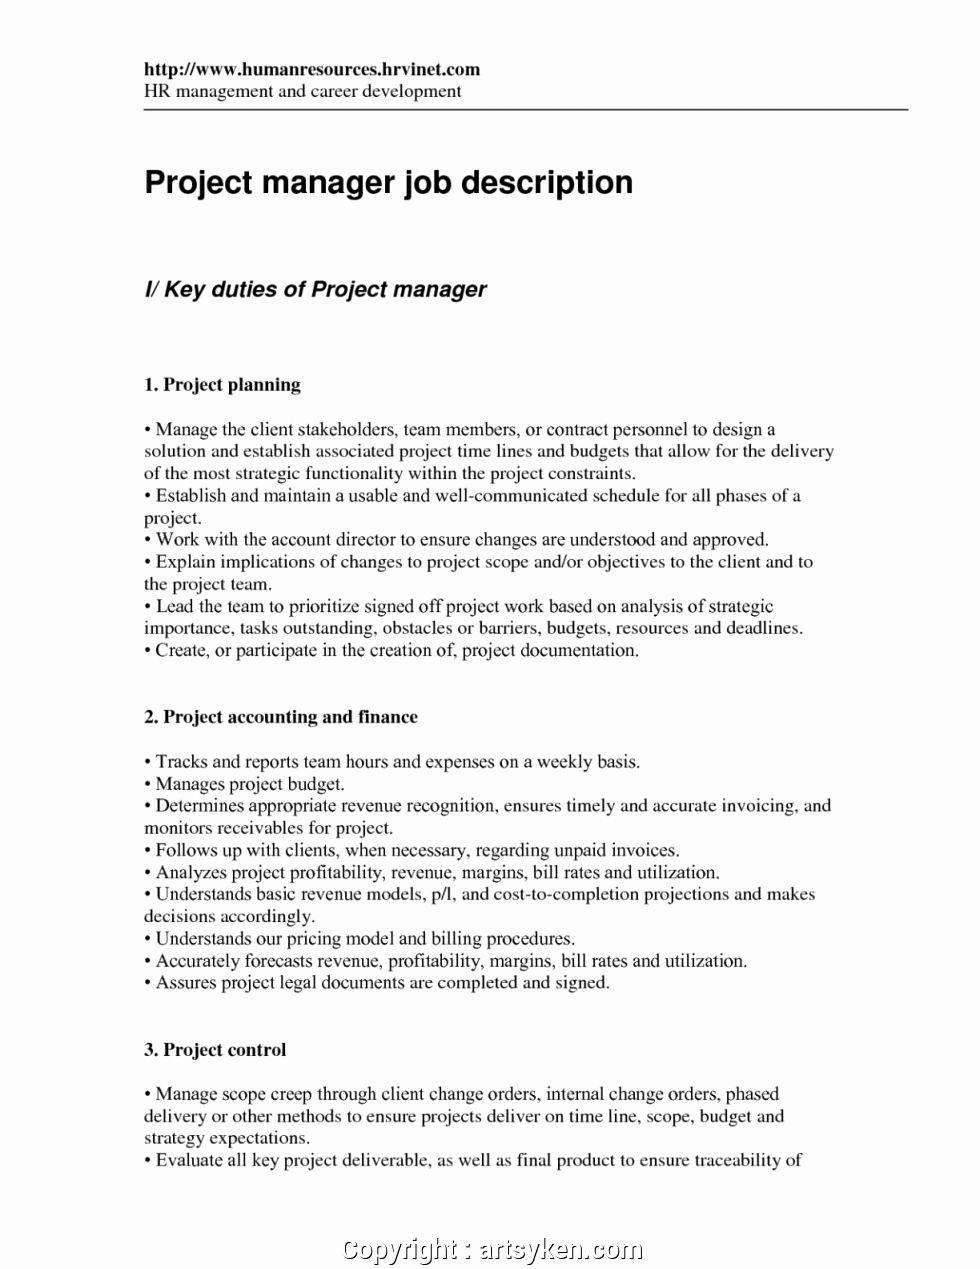 Project Manager Job Description Resume Luxury Free Project Manager Duties Resume Collection Solutions Res Nanny Job Description Job Description Babysitter Jobs